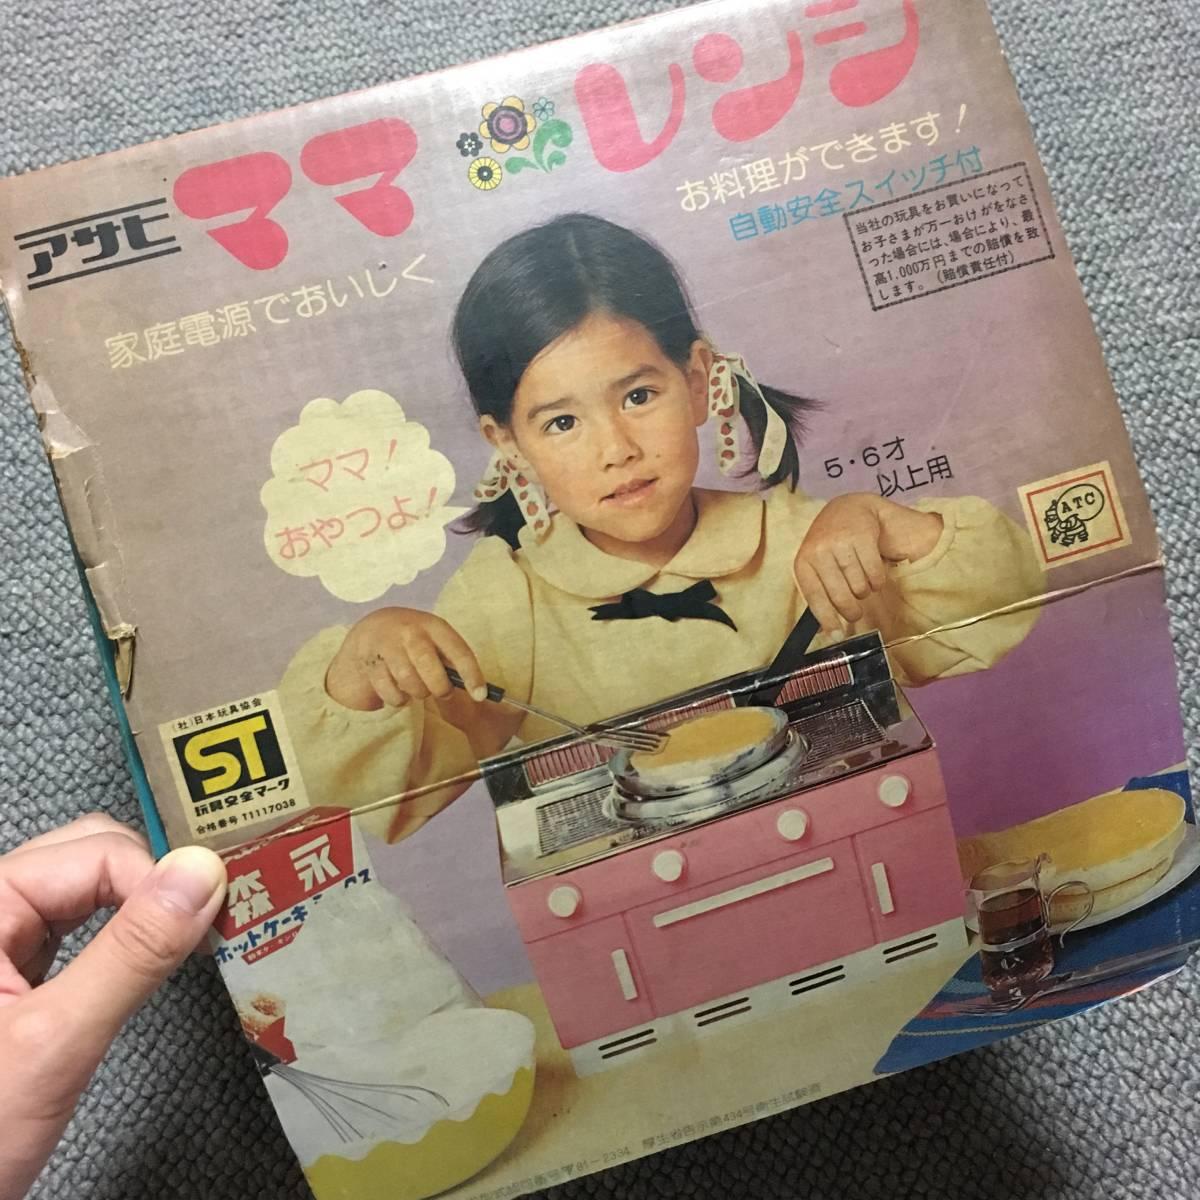 A30 445☆アサヒ ママレンジ 通電OK 動作未確認 昭和レトロ